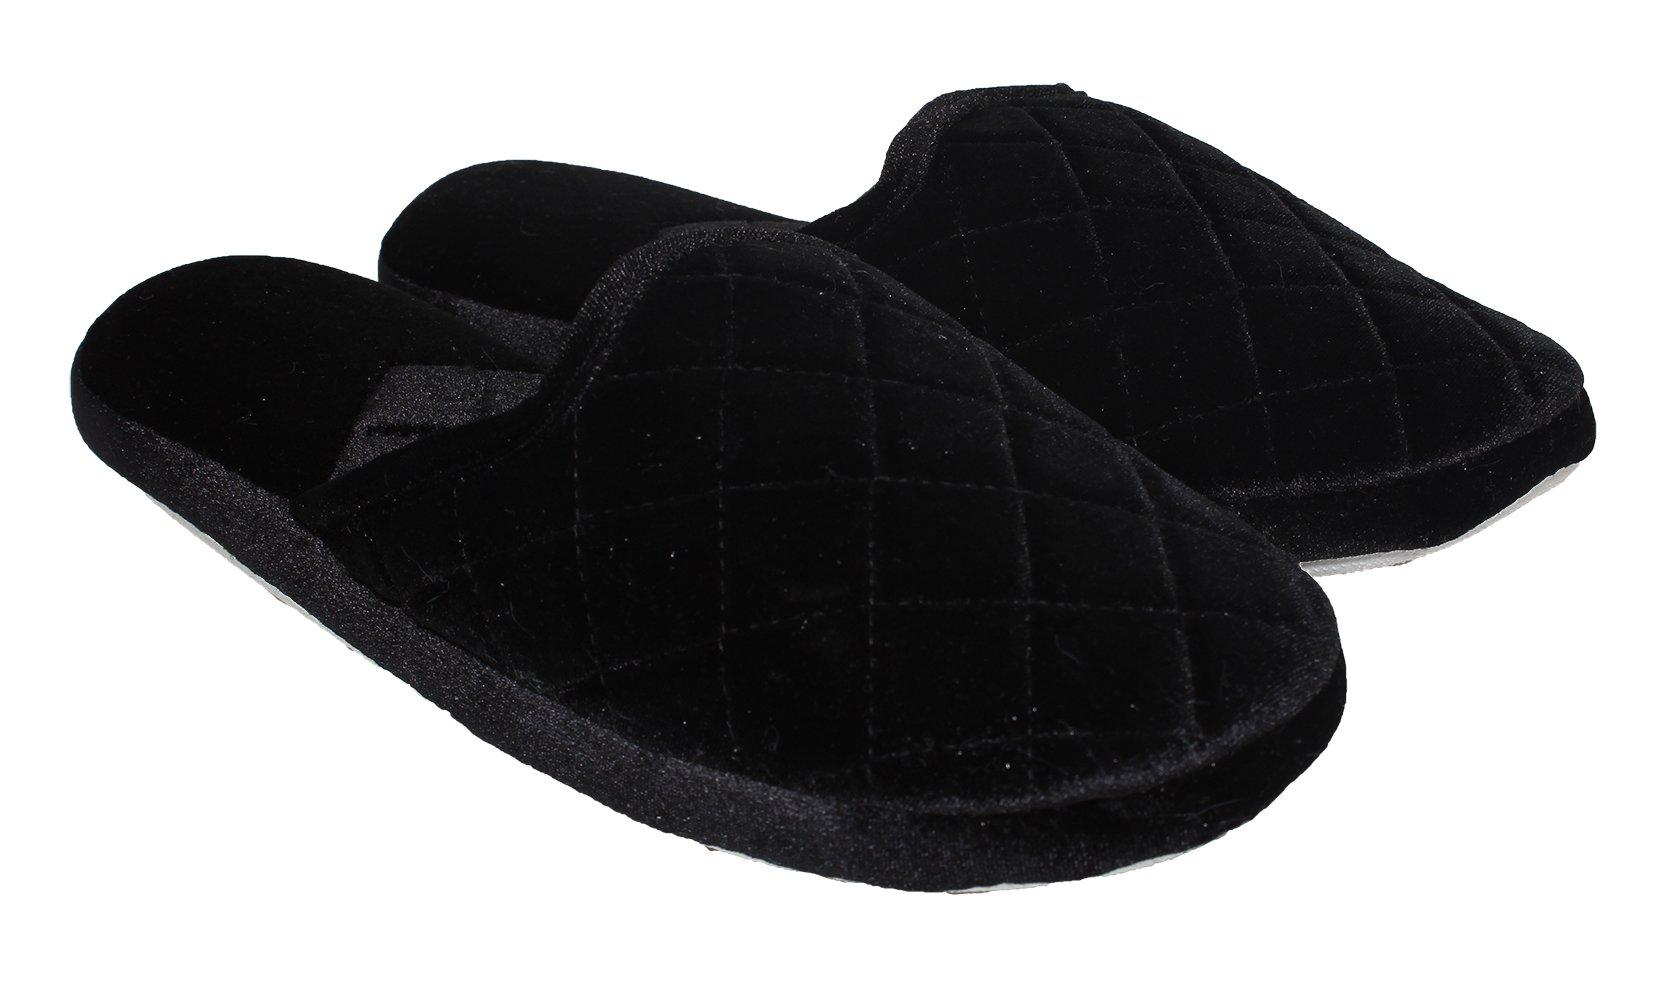 Blue Star Women's Comfort Memory Foam Velvet House Slippers Slip-Resistant Rubber Sole  Indoor/Outdoor